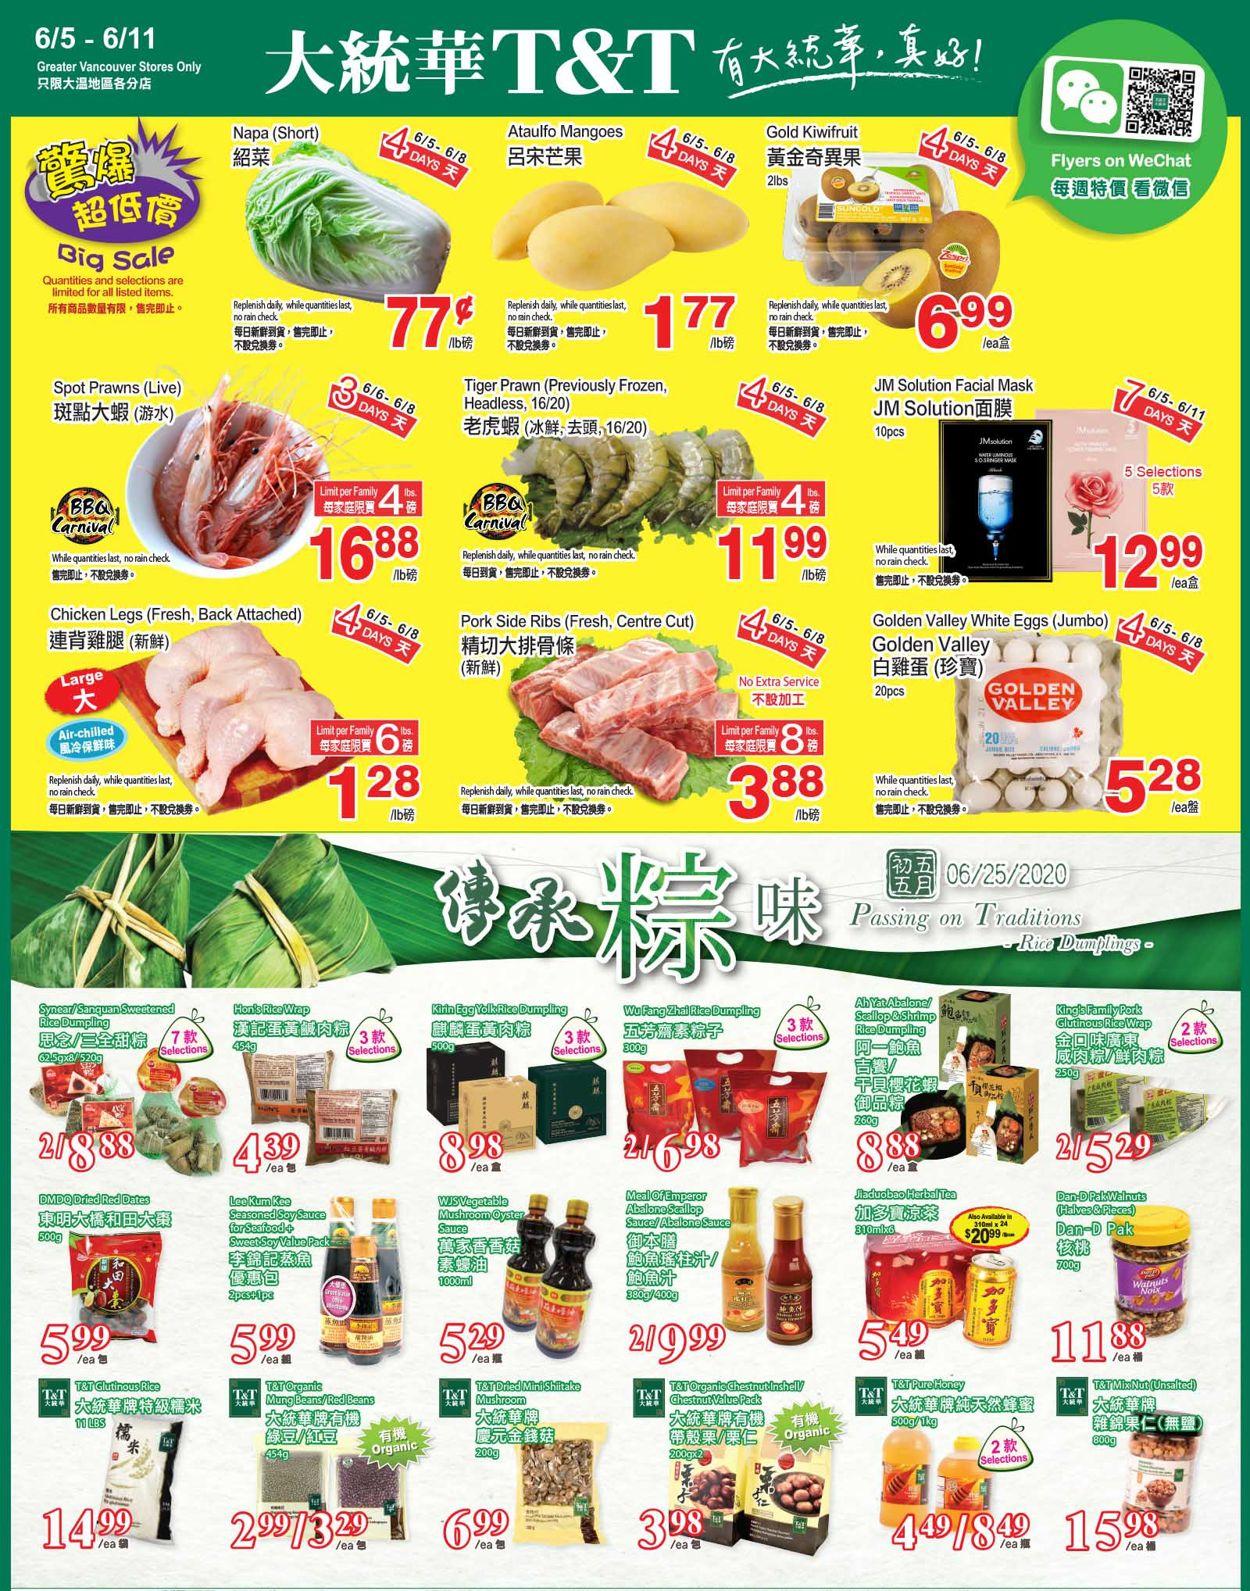 T&T Supermarket Flyer - 06/05-06/11/2020